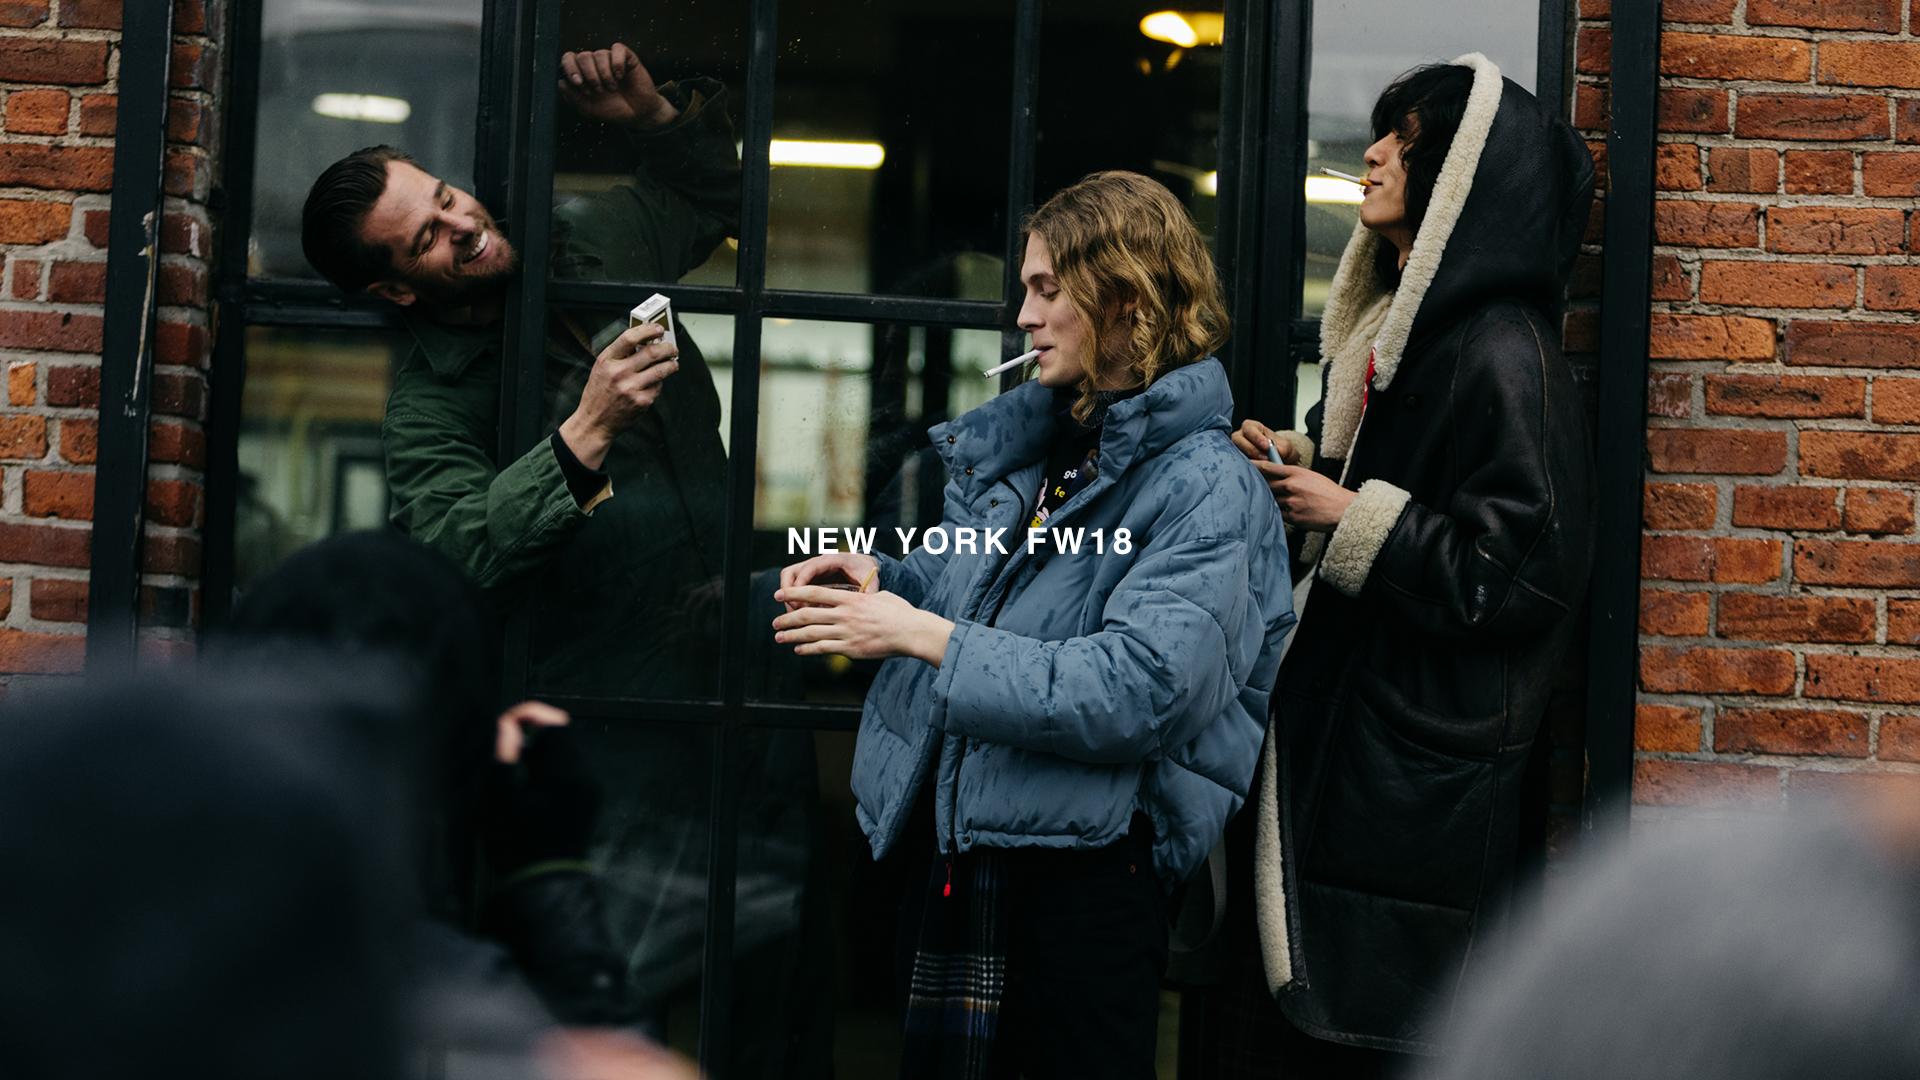 NYCFW18.jpg